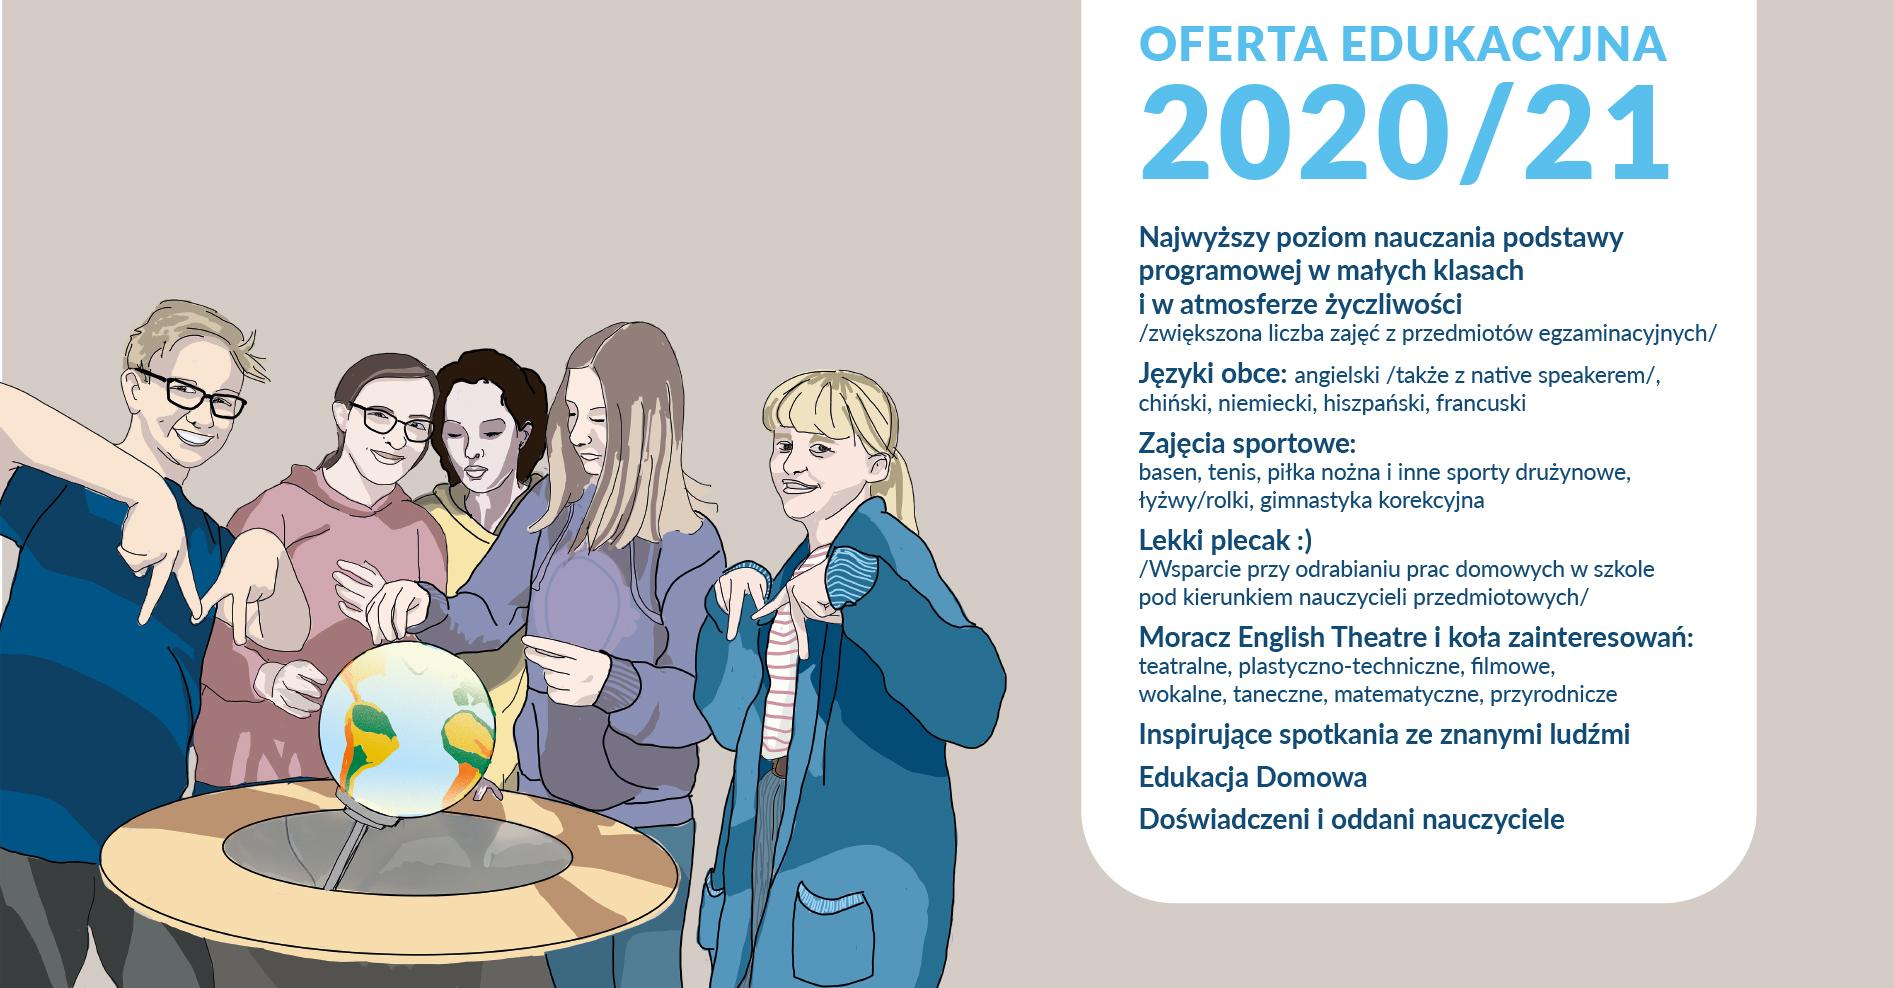 oferta edukacyjna 2020/21